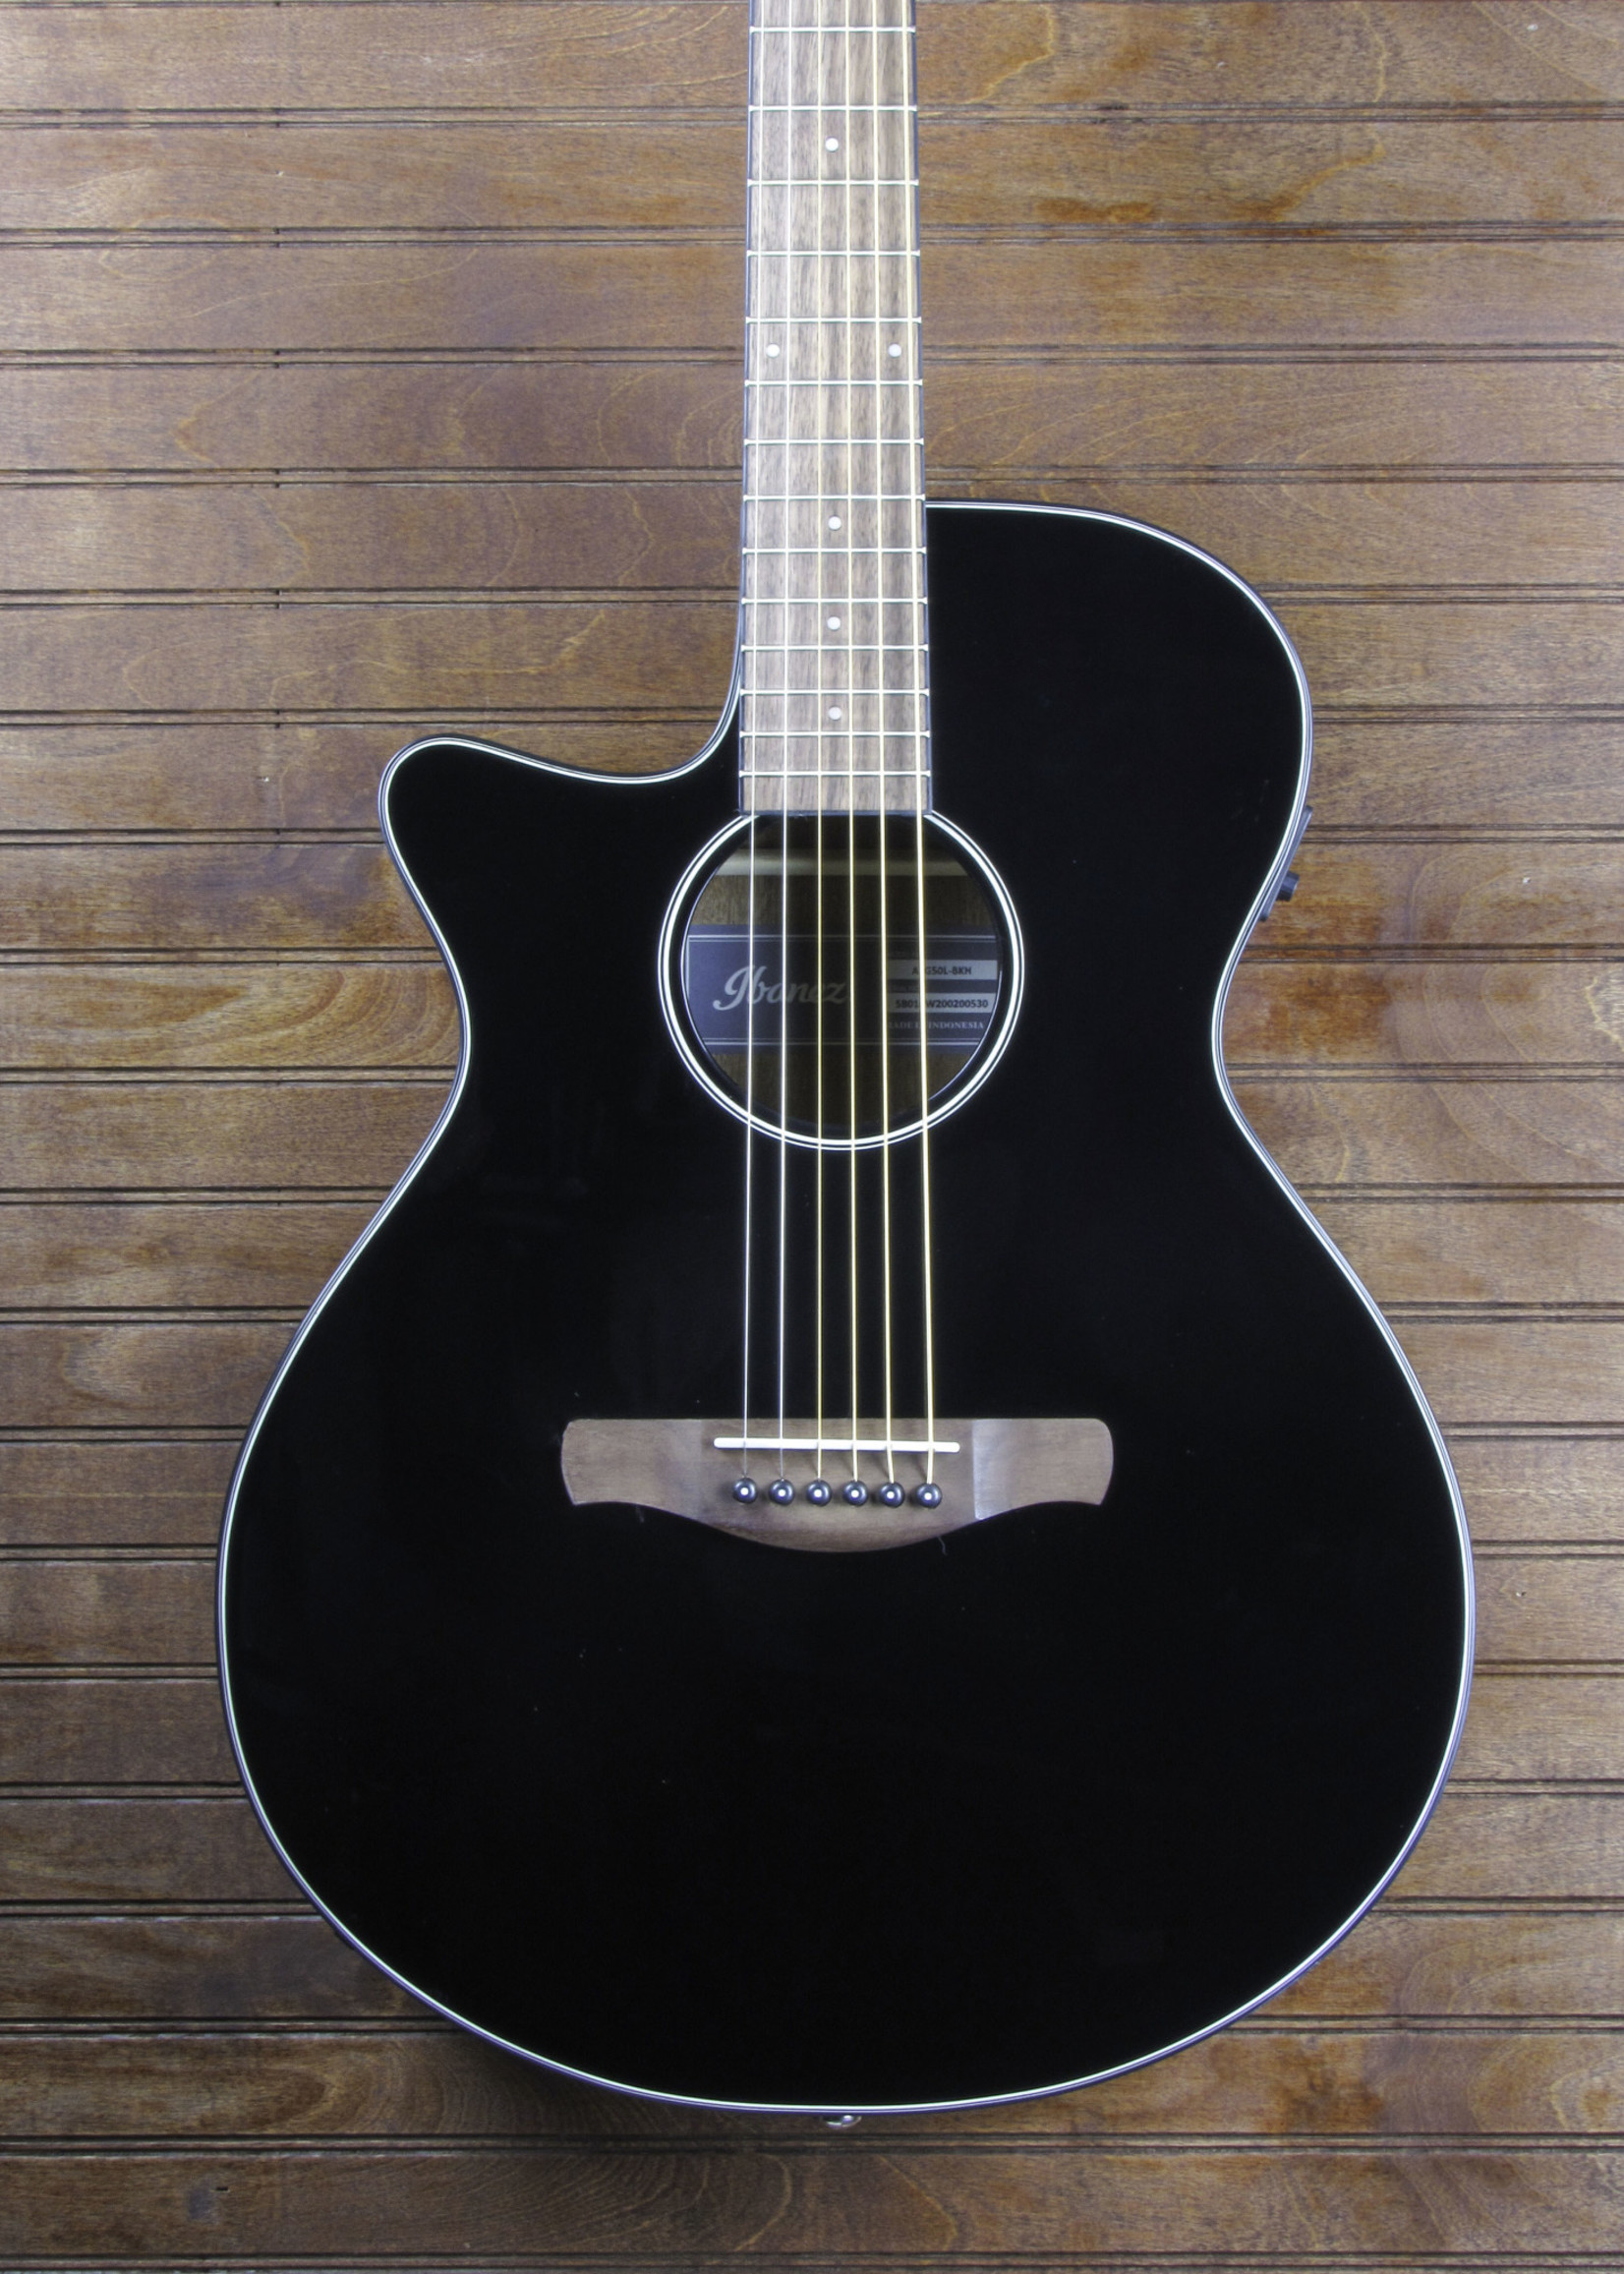 Ibanez AEG50 Black Left Handed